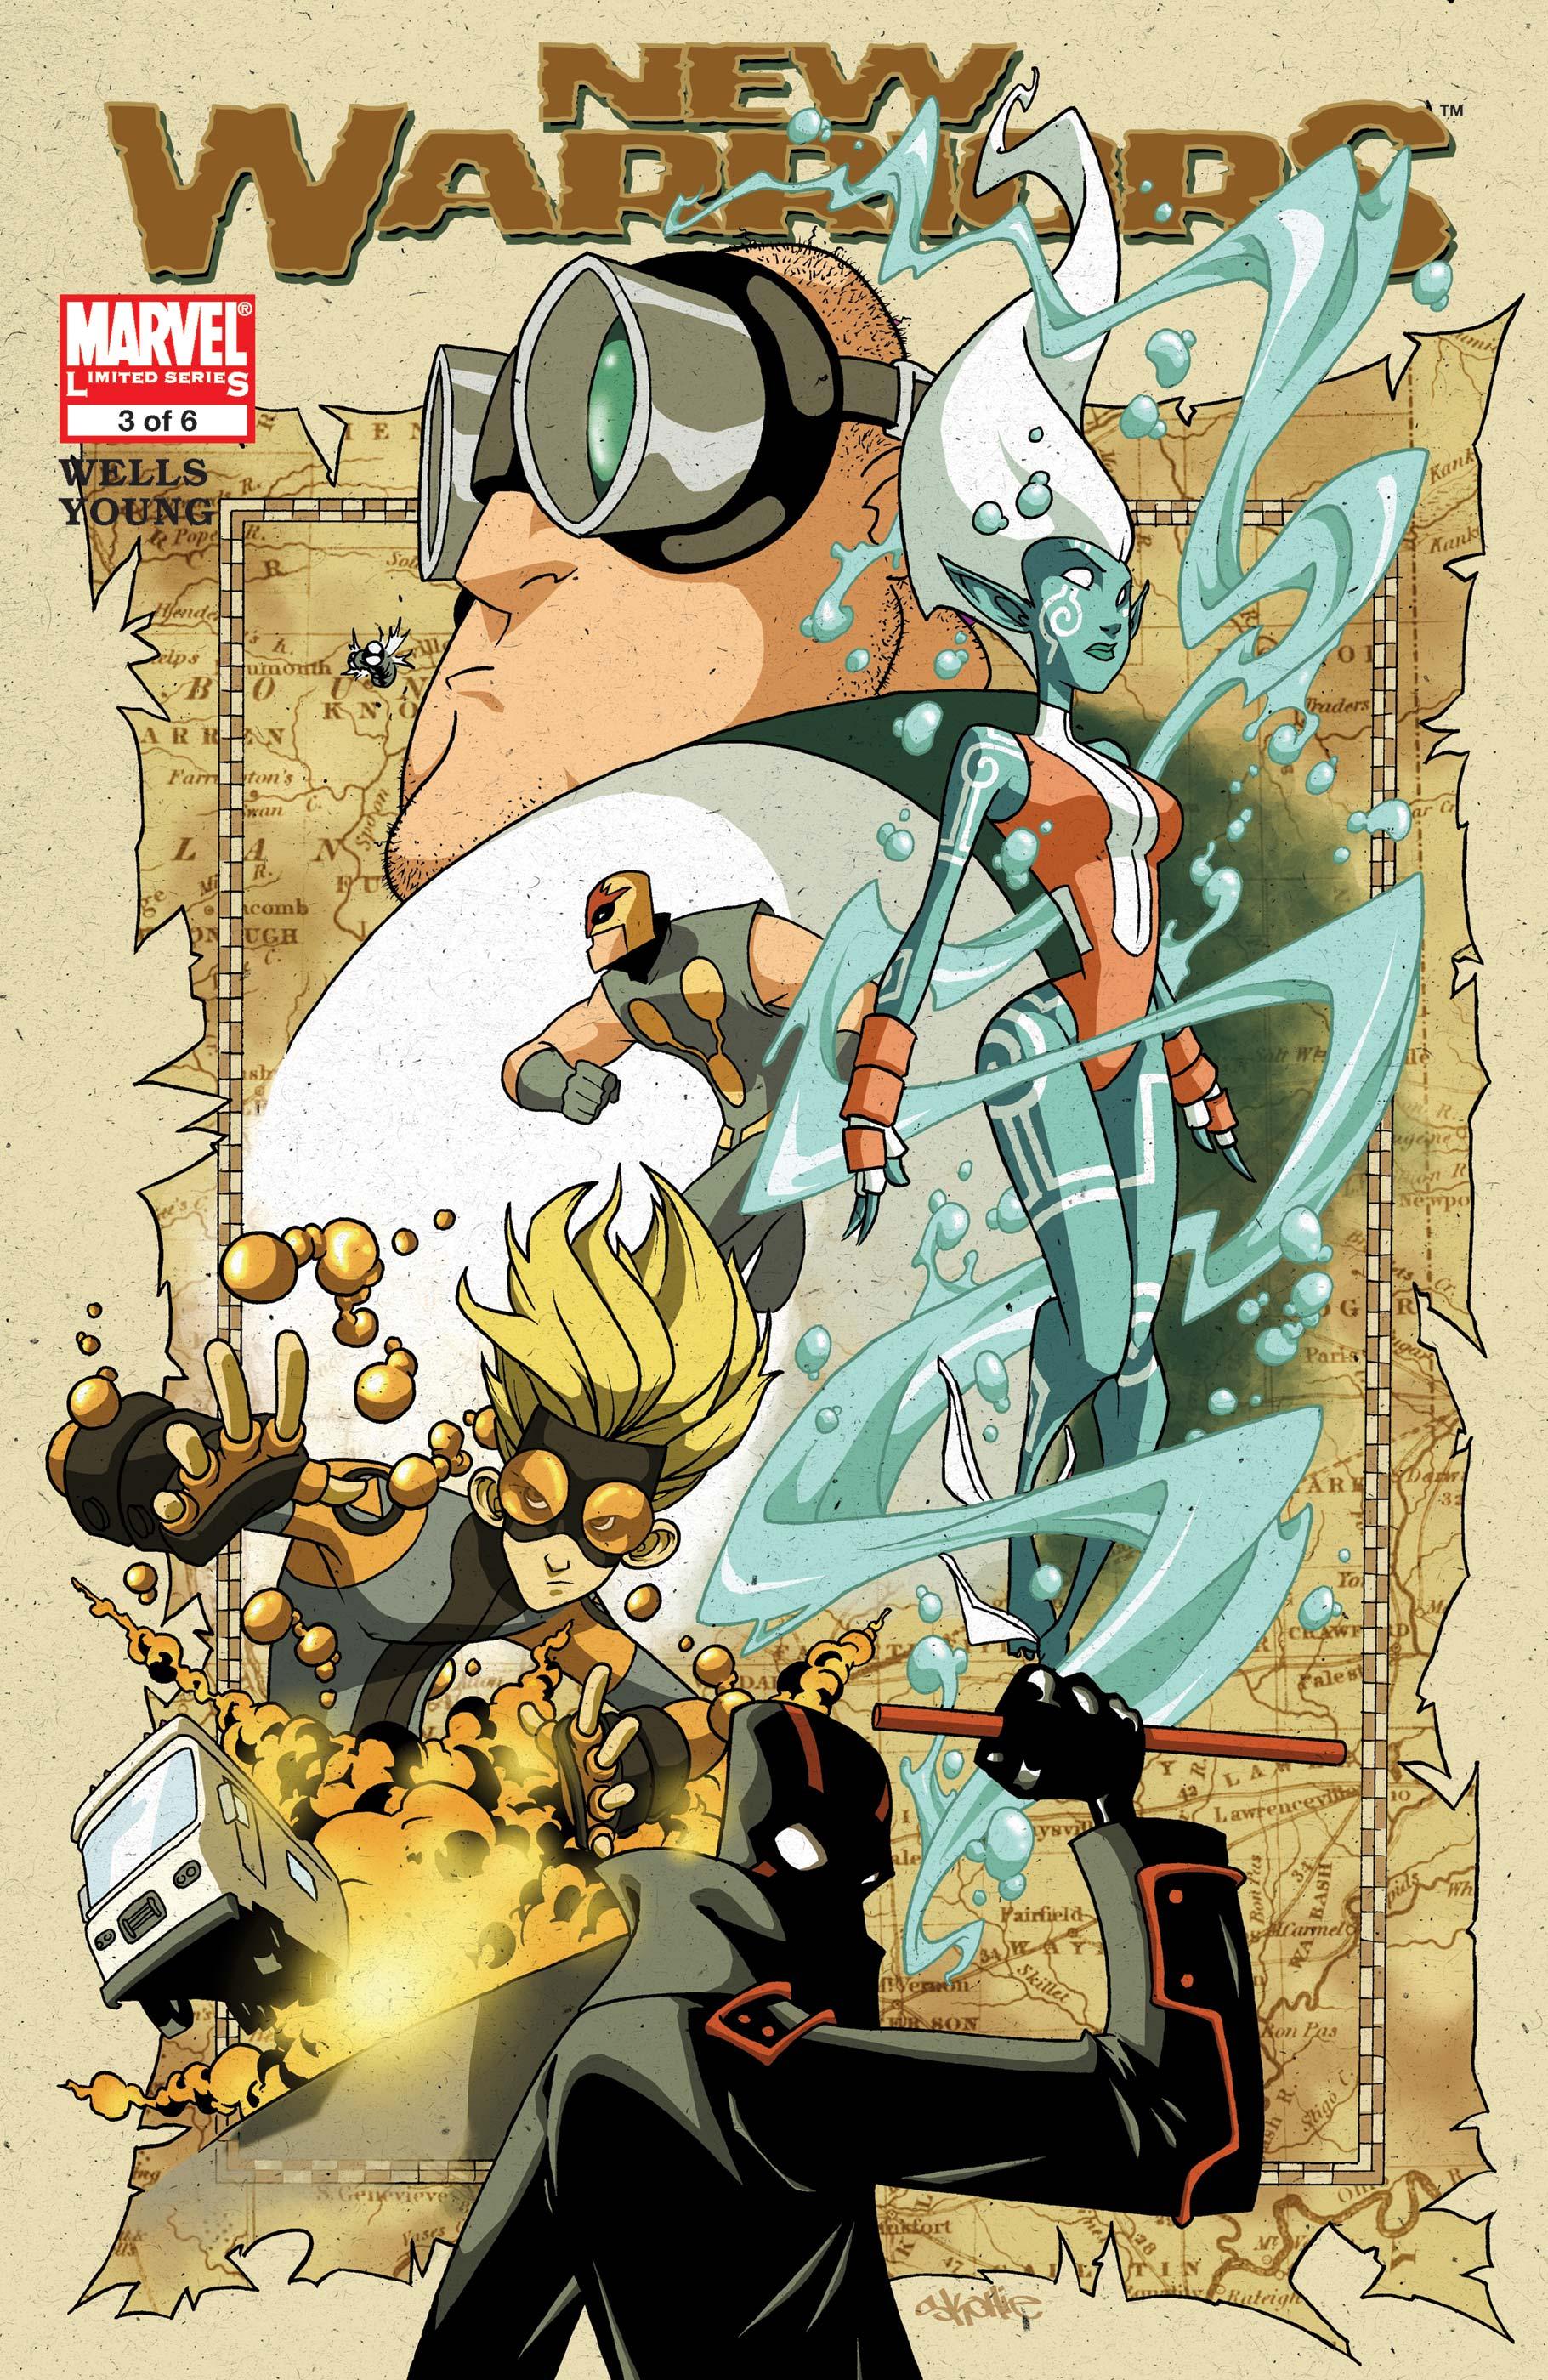 New Warriors (2005) #3